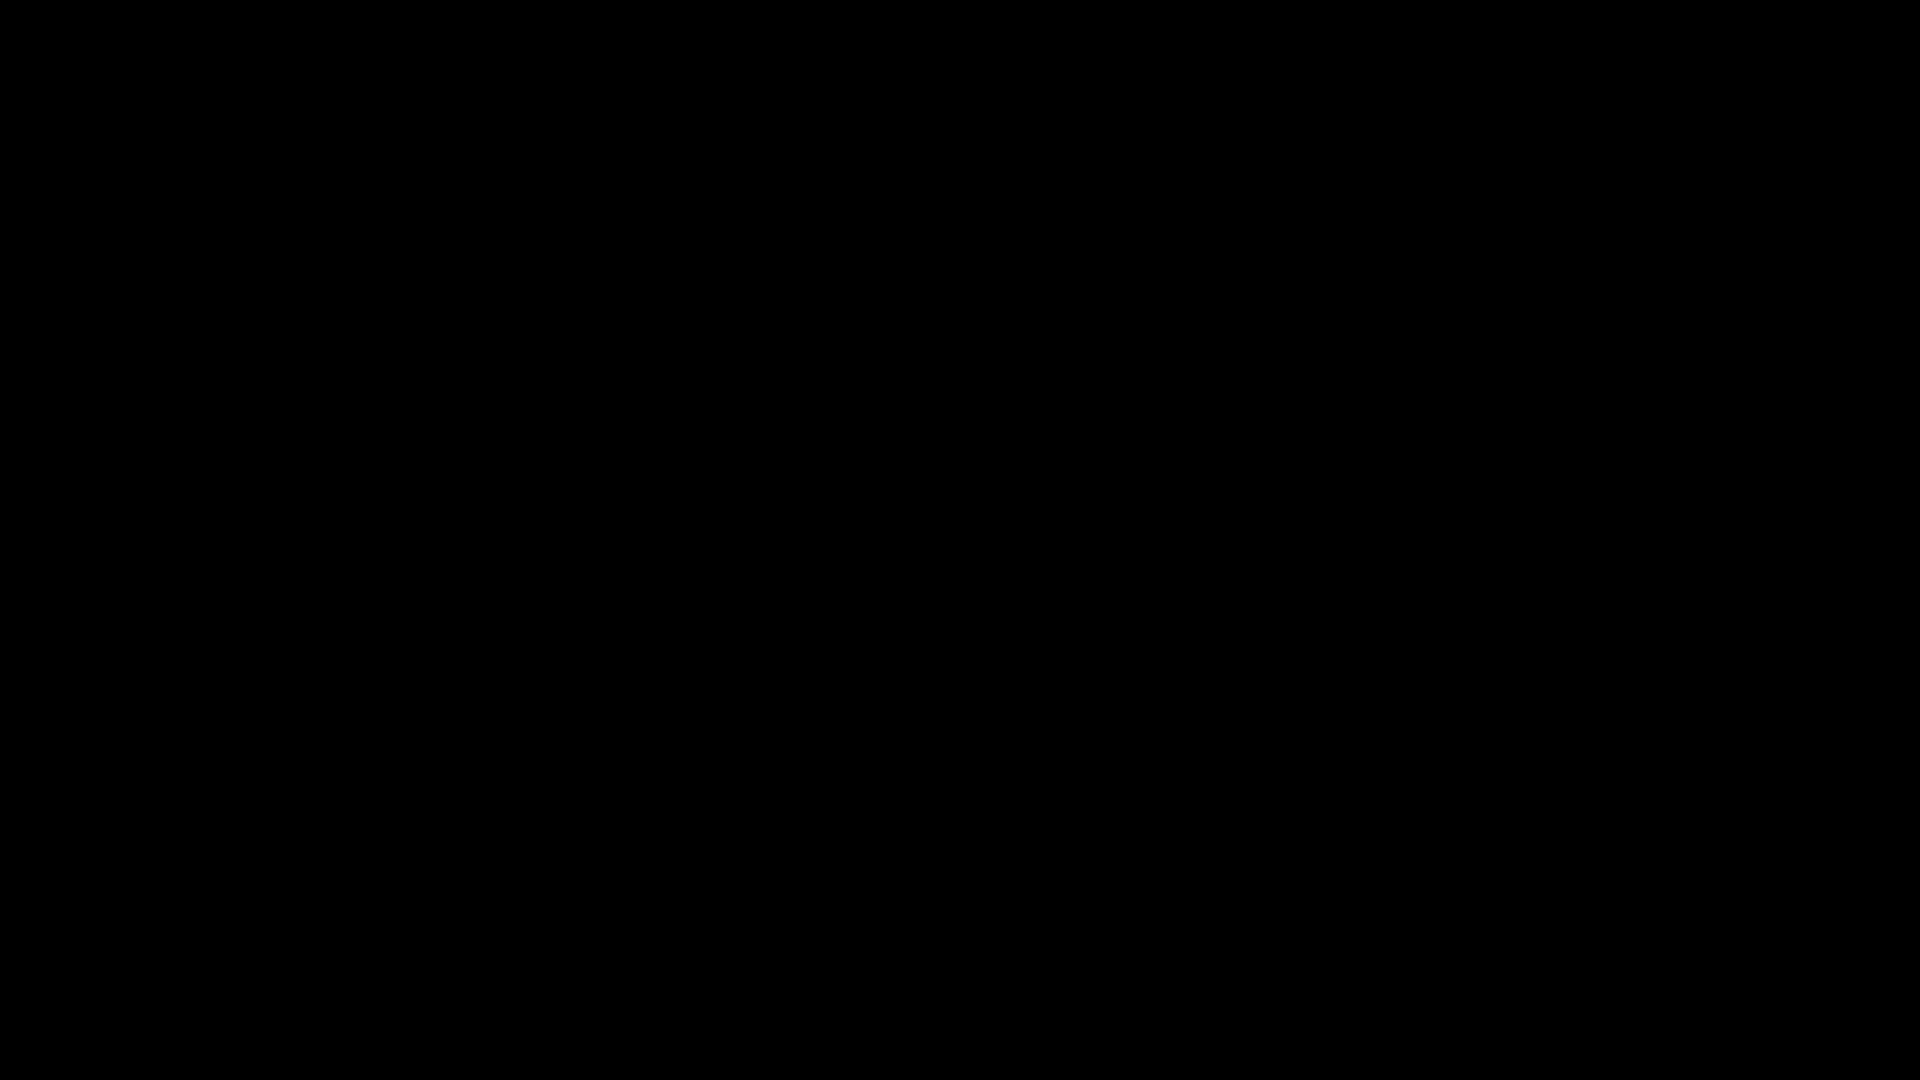 2017-04-05-16.08.57